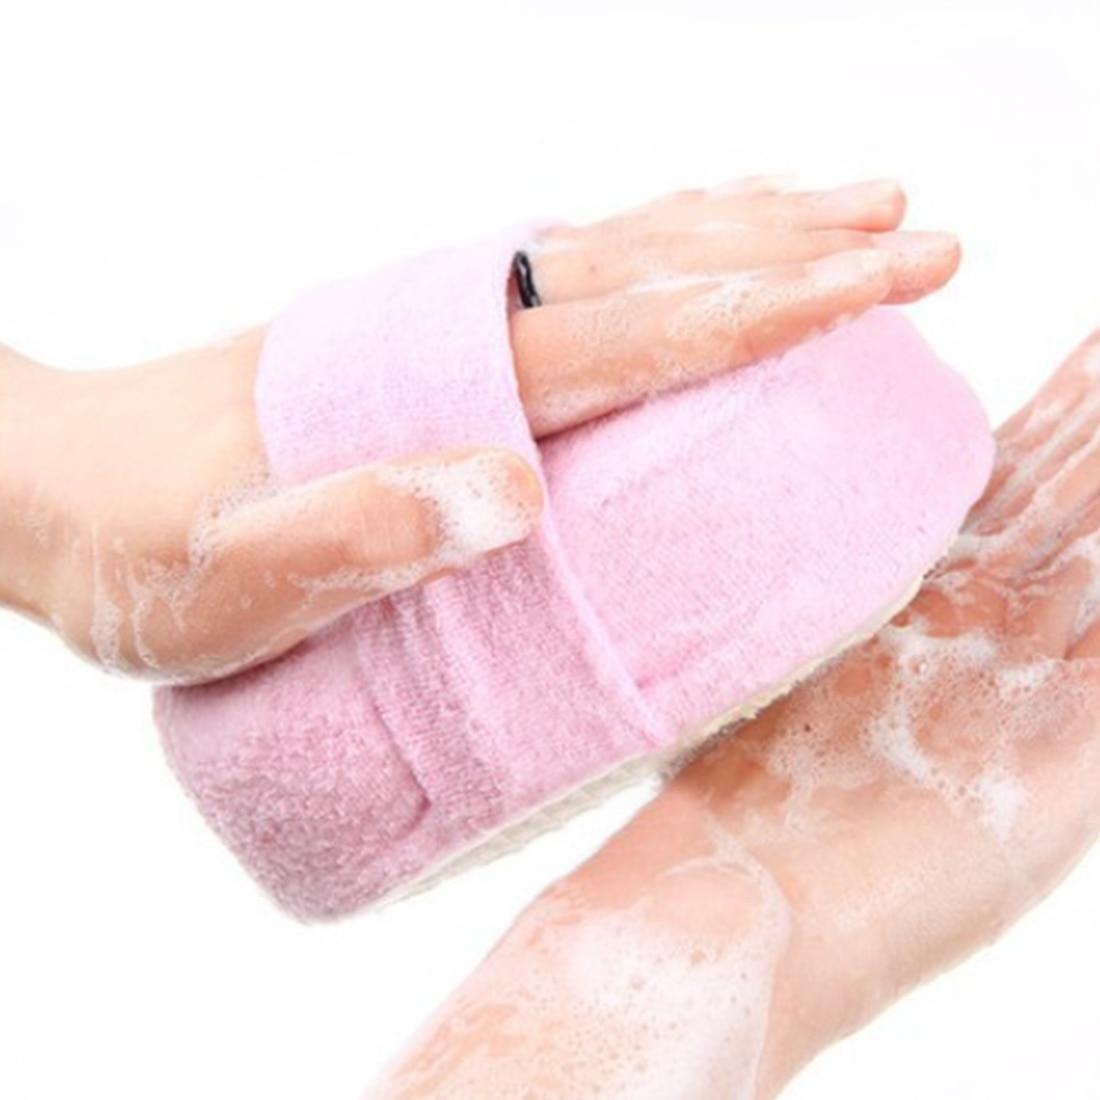 Massager Shower Back Spa Scrubber Bath Ball Bath Tubs Cool Ball Bath Towel Scrubber Body Cleaning Mesh Shower Wash Sponge